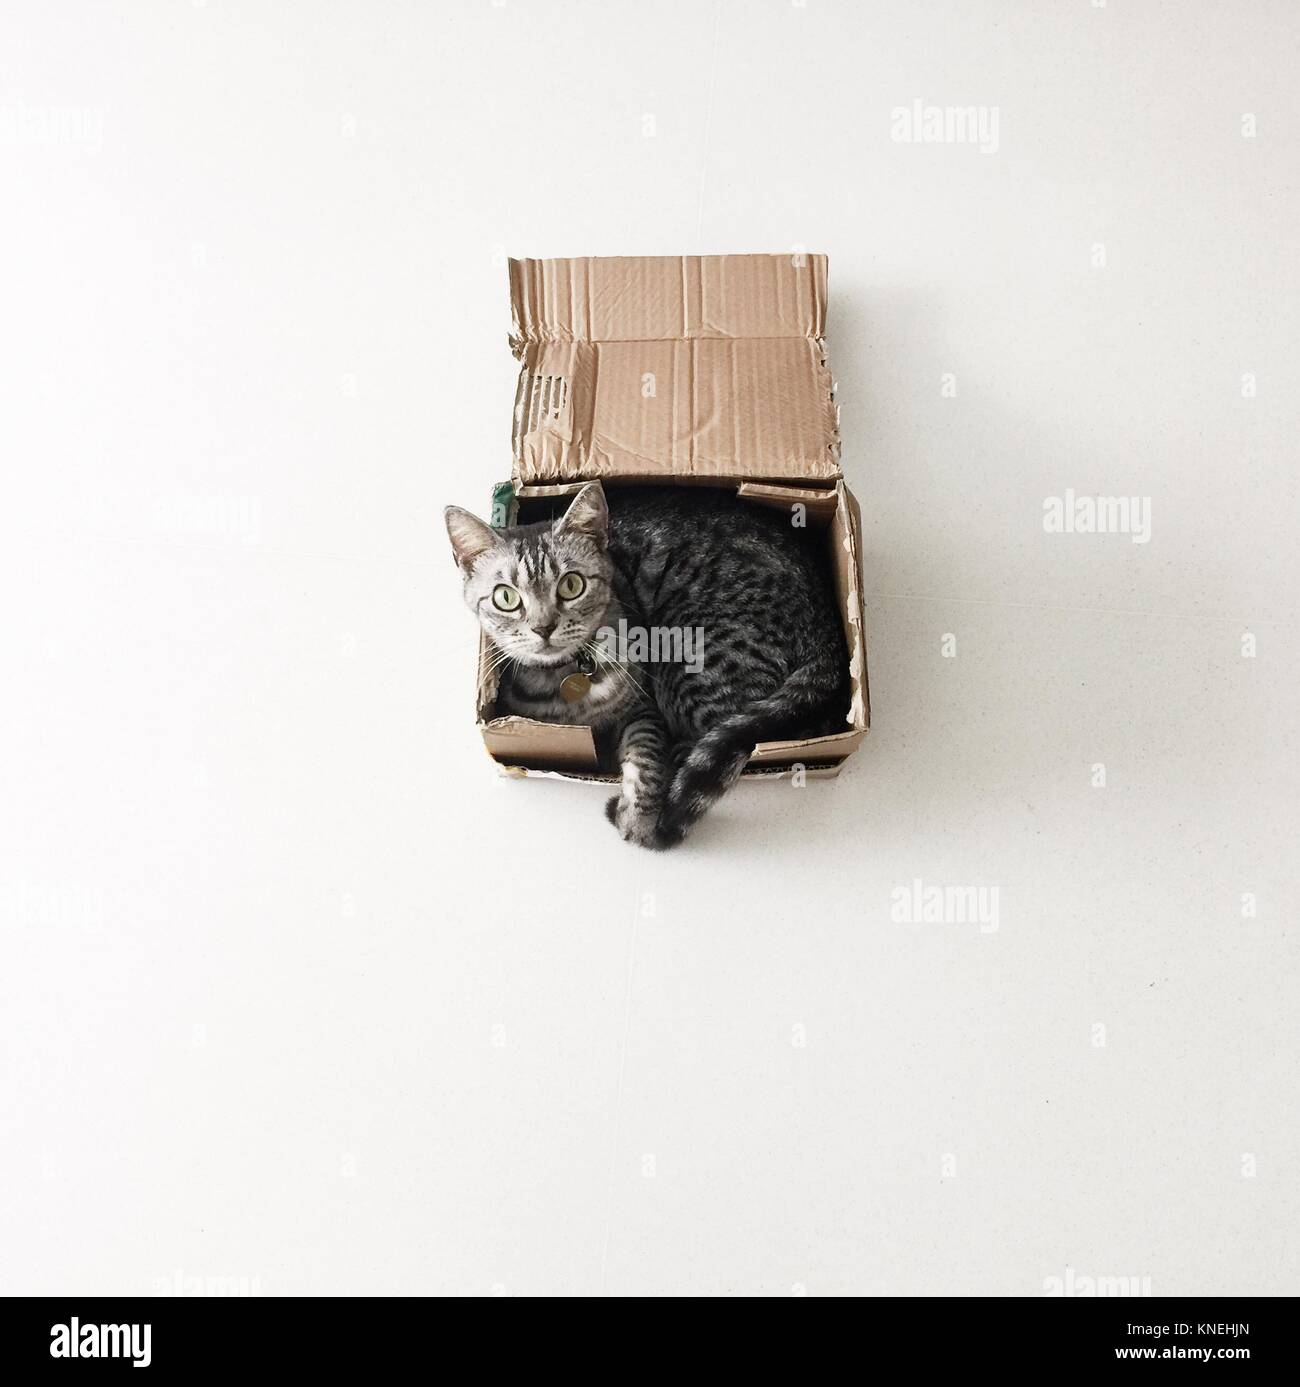 American shorthair cat lying in a cardboard box Stock Photo